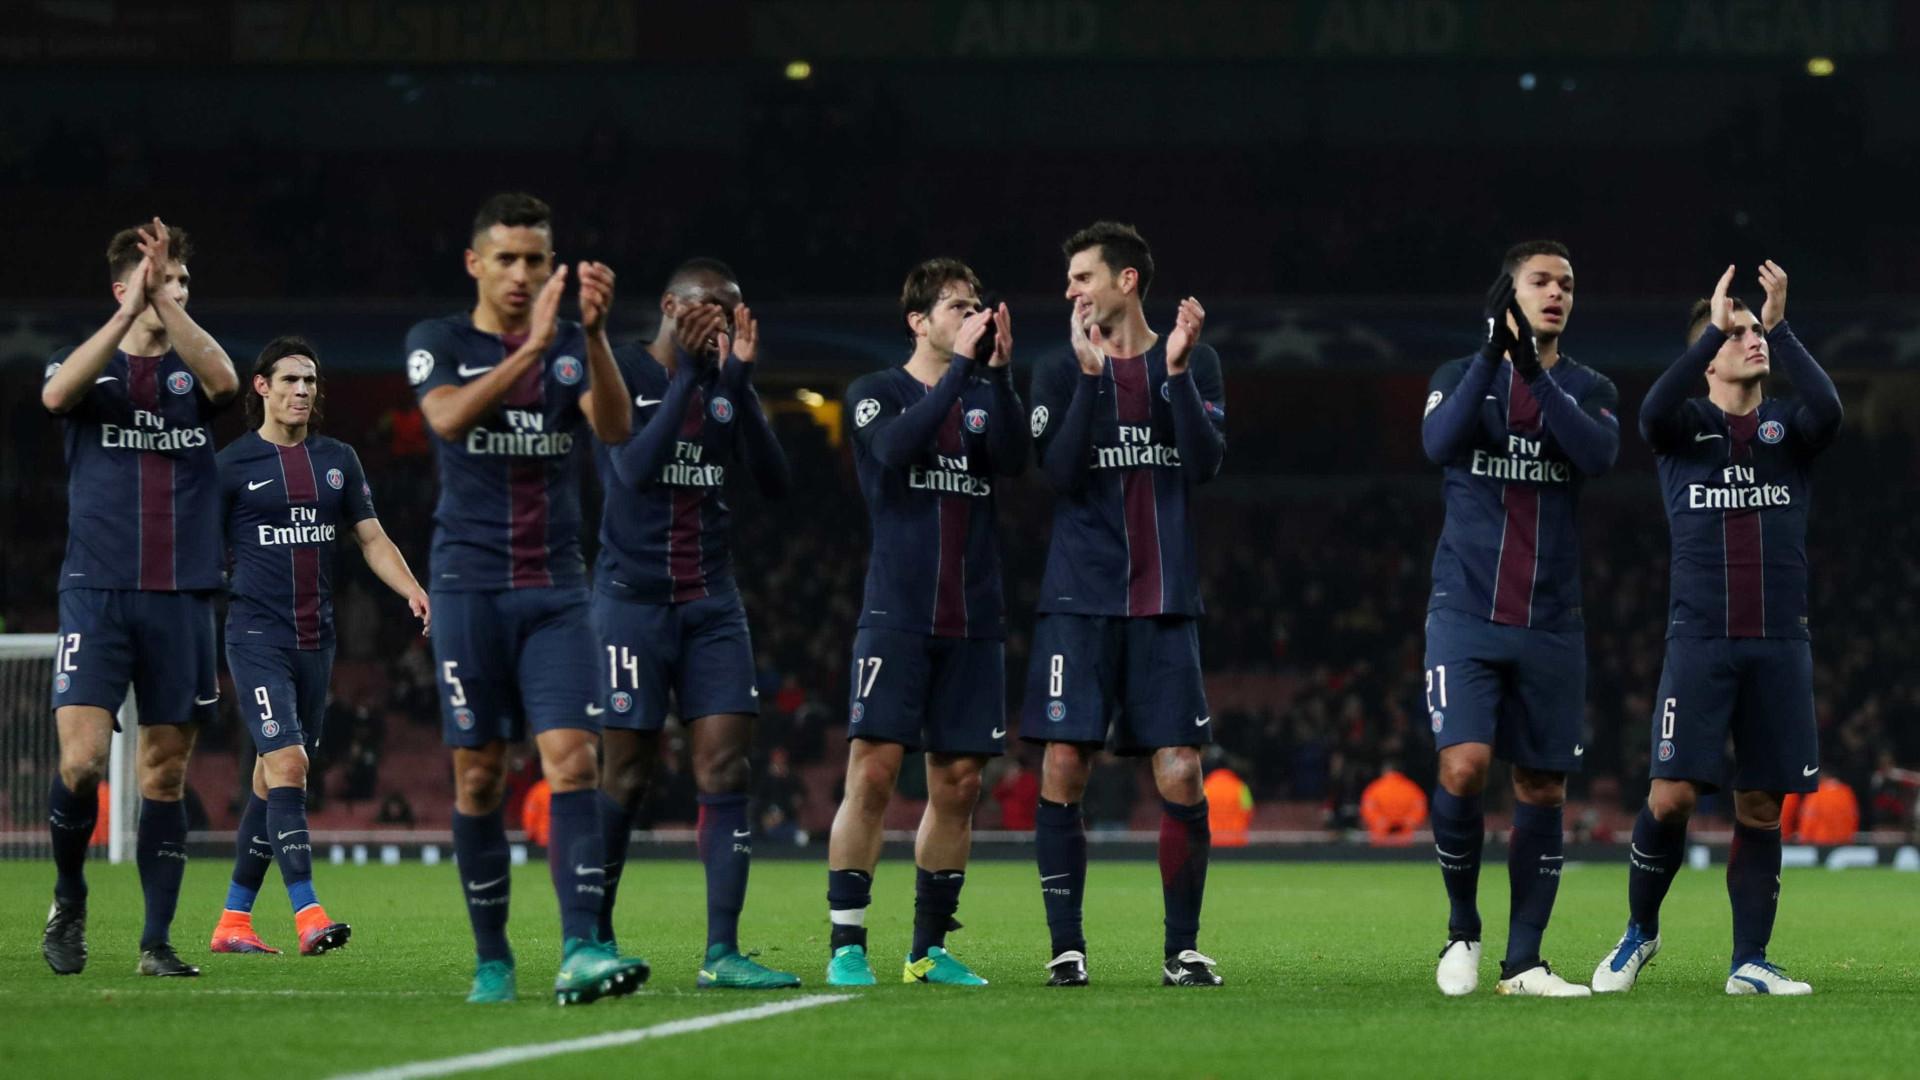 Paris Saint-Germain vai doar 11 milhões de euros ao Chapecoense